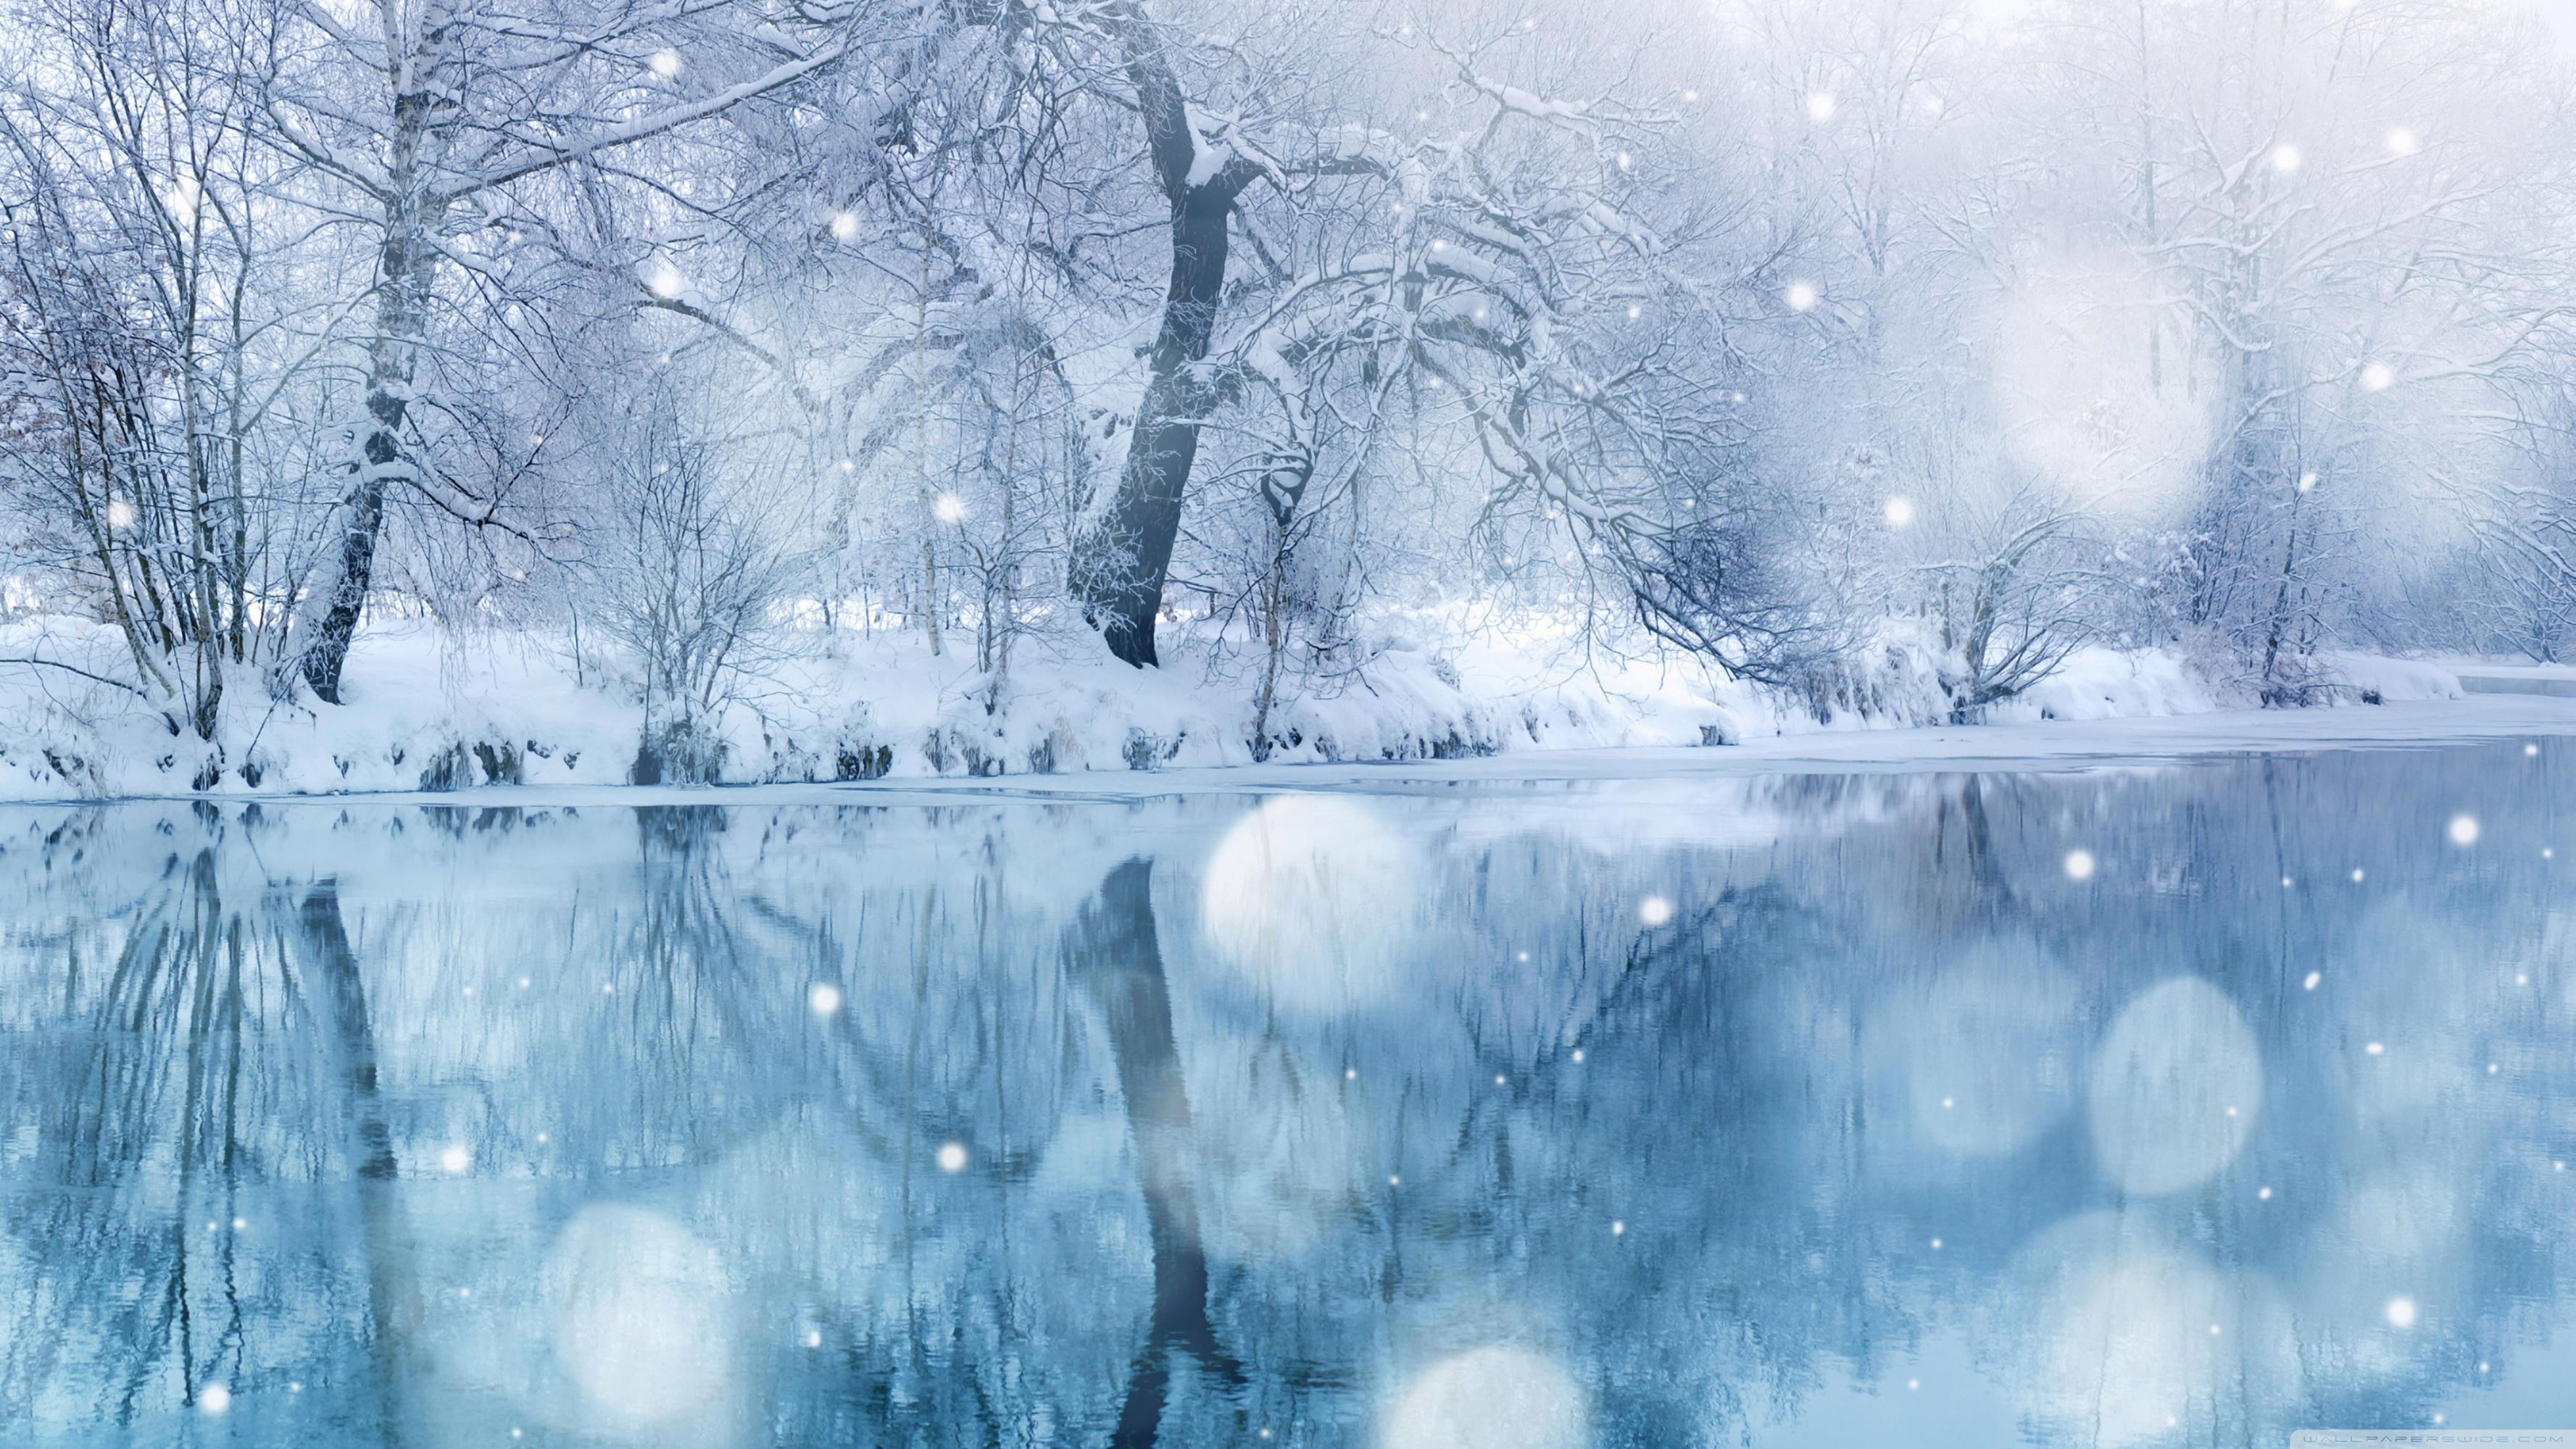 Winter Snowfall 4K HD Desktop Wallpaper